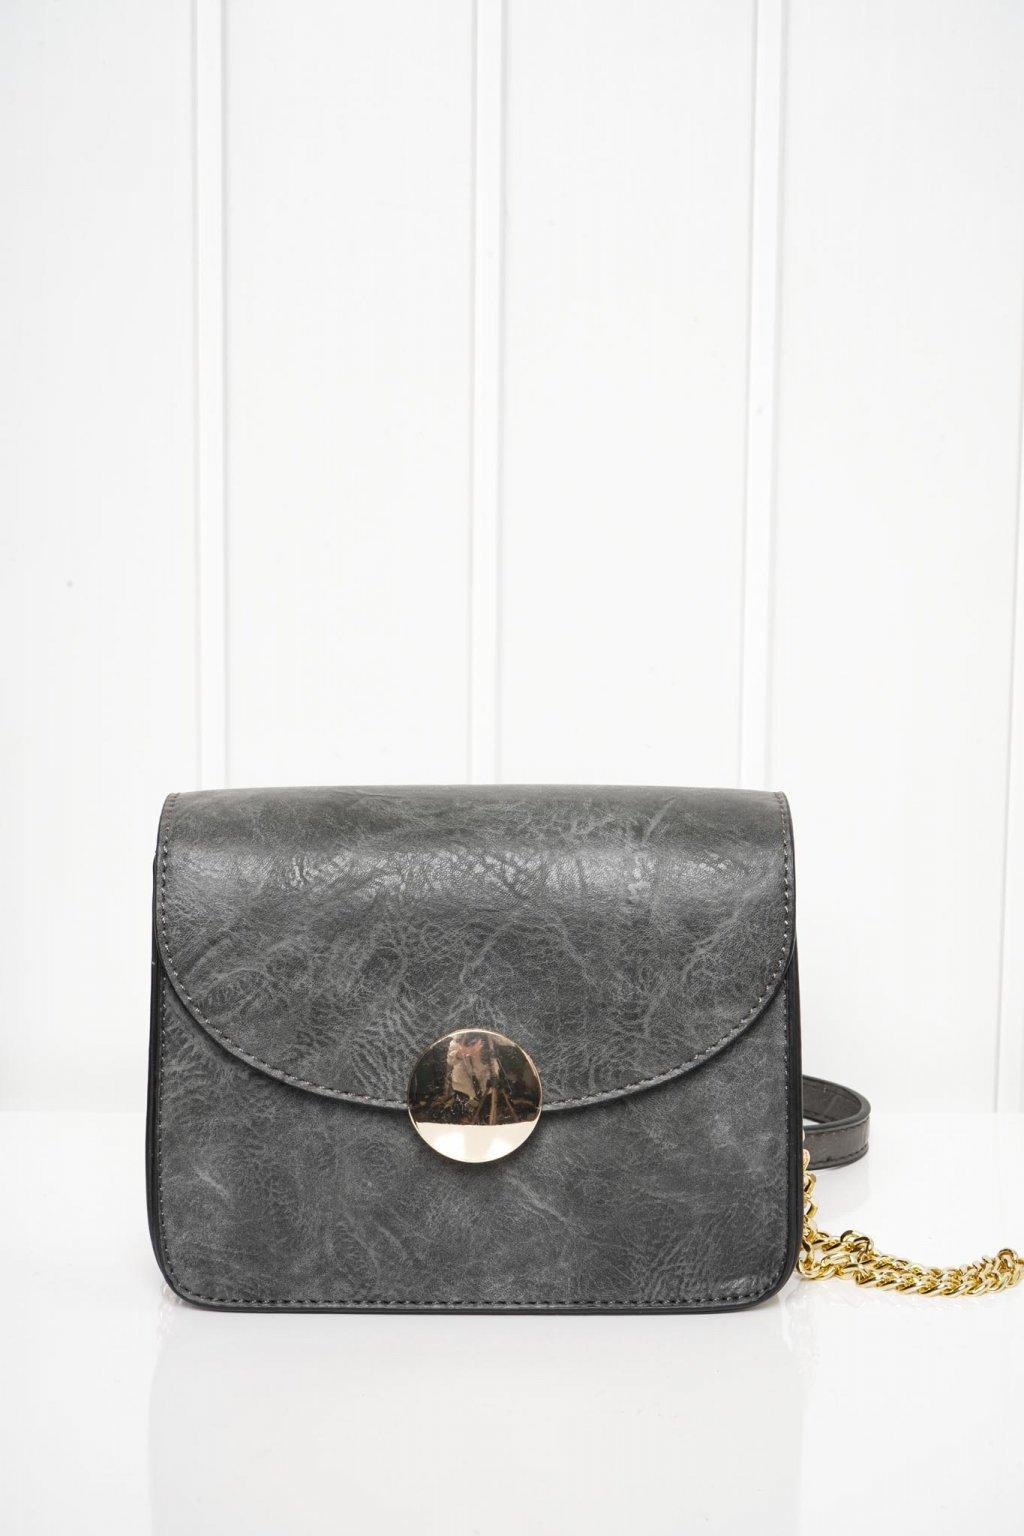 Kabelka, crossbody, ruksak, shopping bag, shopperka, 240